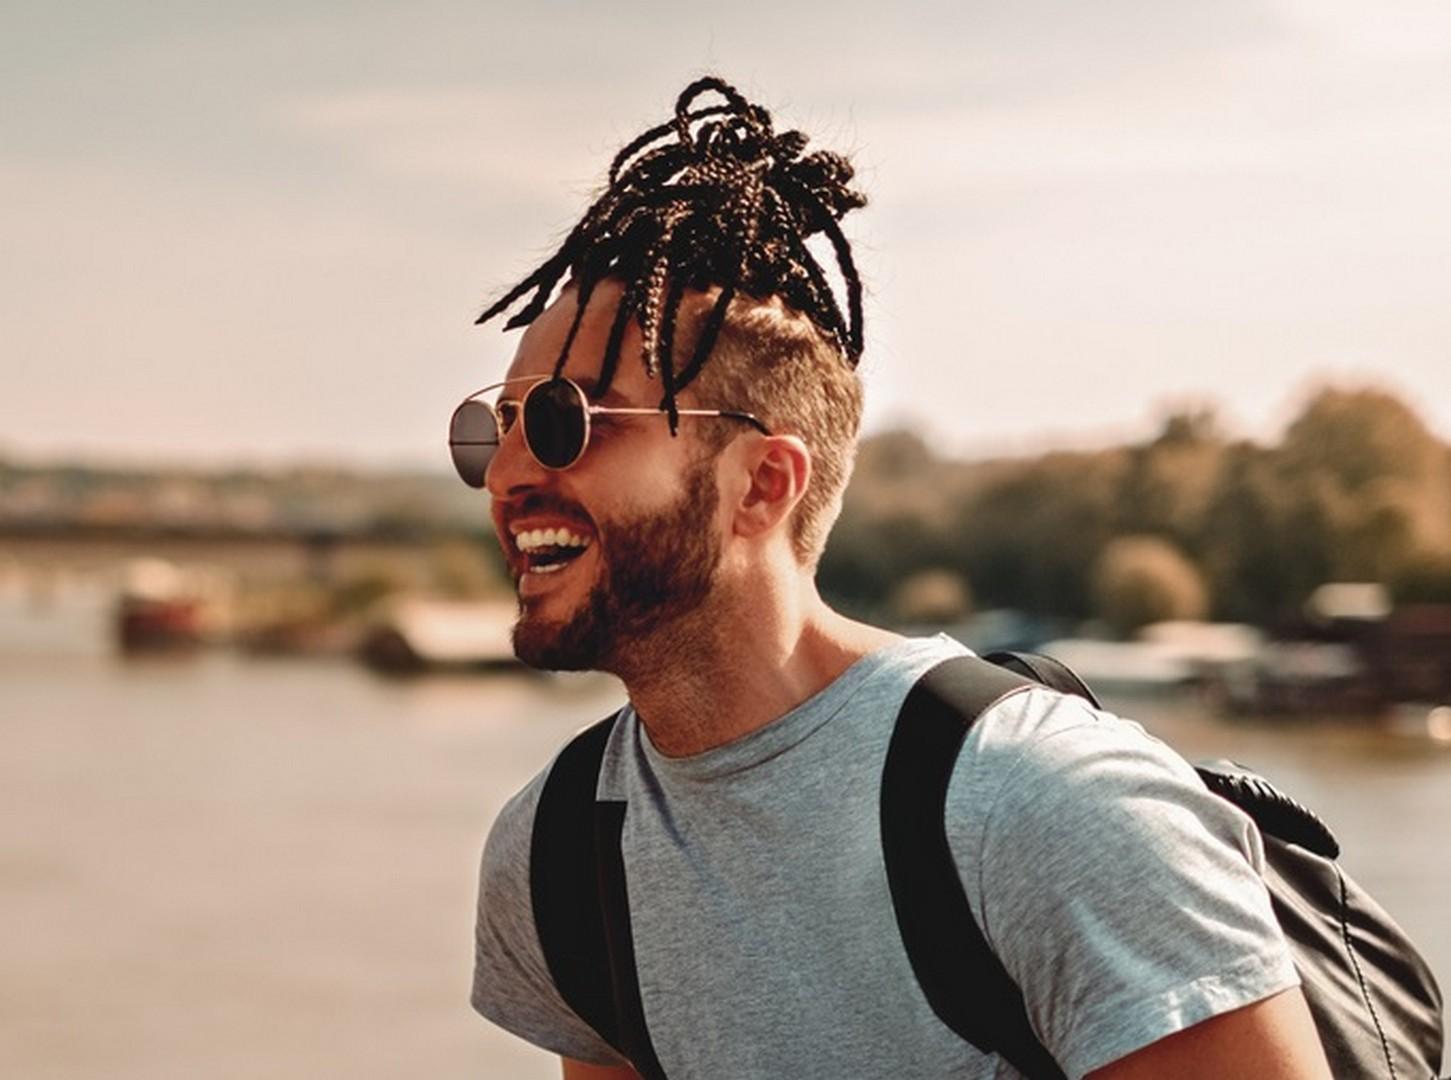 cortes de cabelo masculino crespo 38 - 16 cortes de cabelo masculino crespo para nunca mais dizer que ficou sem criatividade